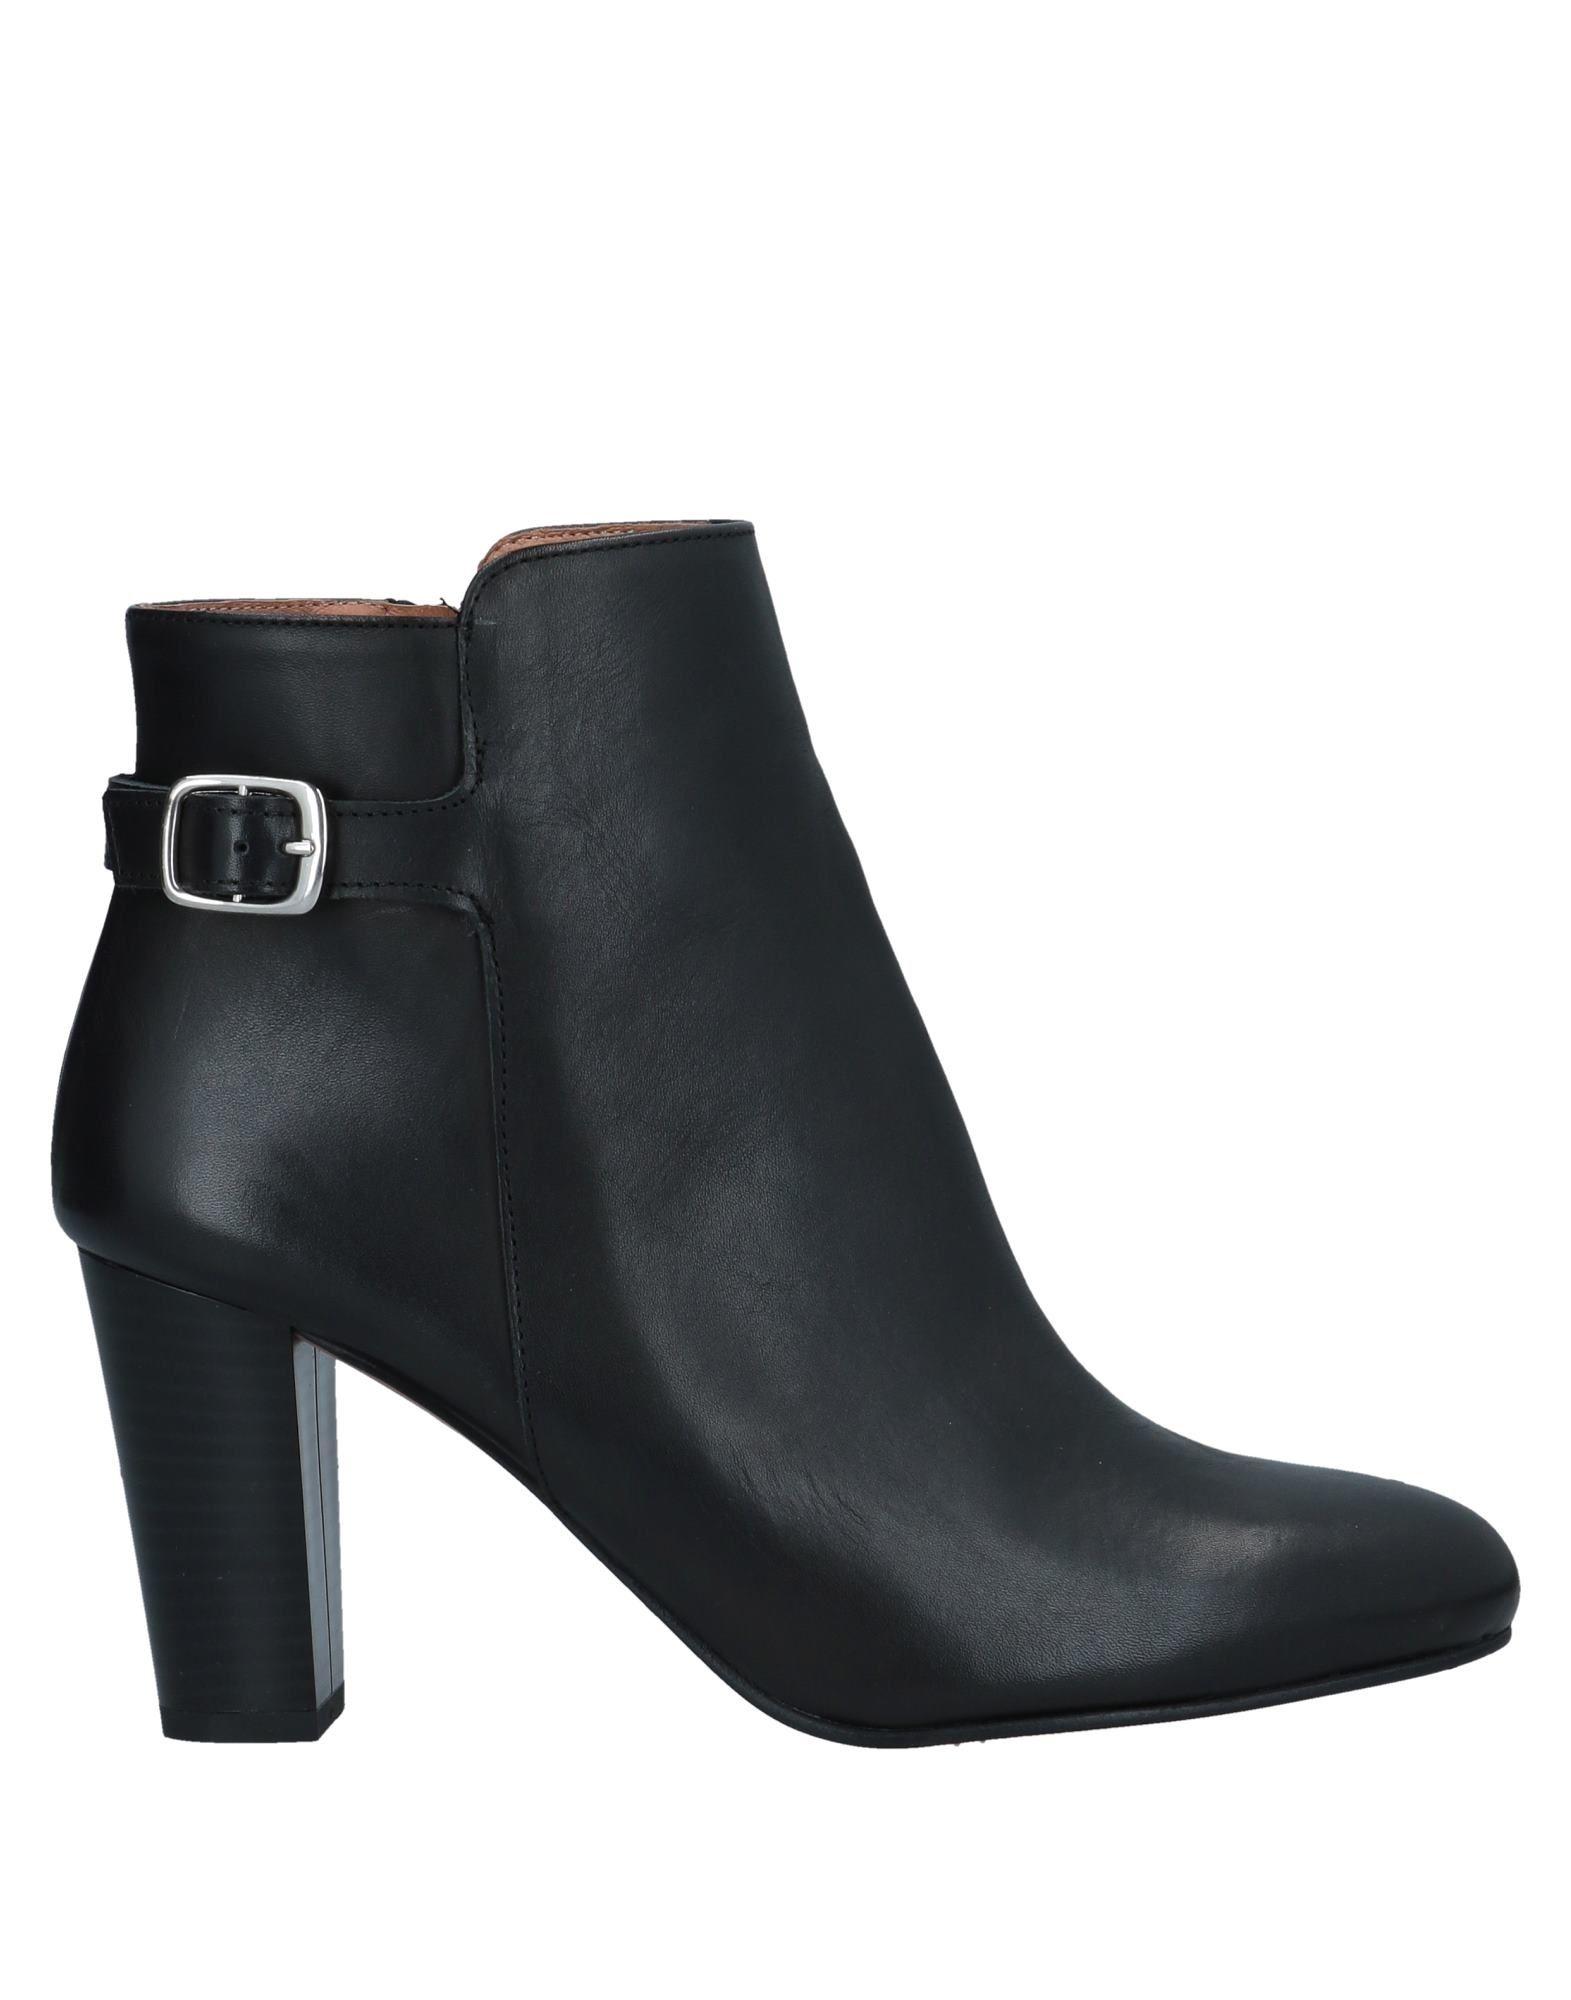 Stilvolle billige Schuhe Apologie Stiefelette Damen  11548305PK